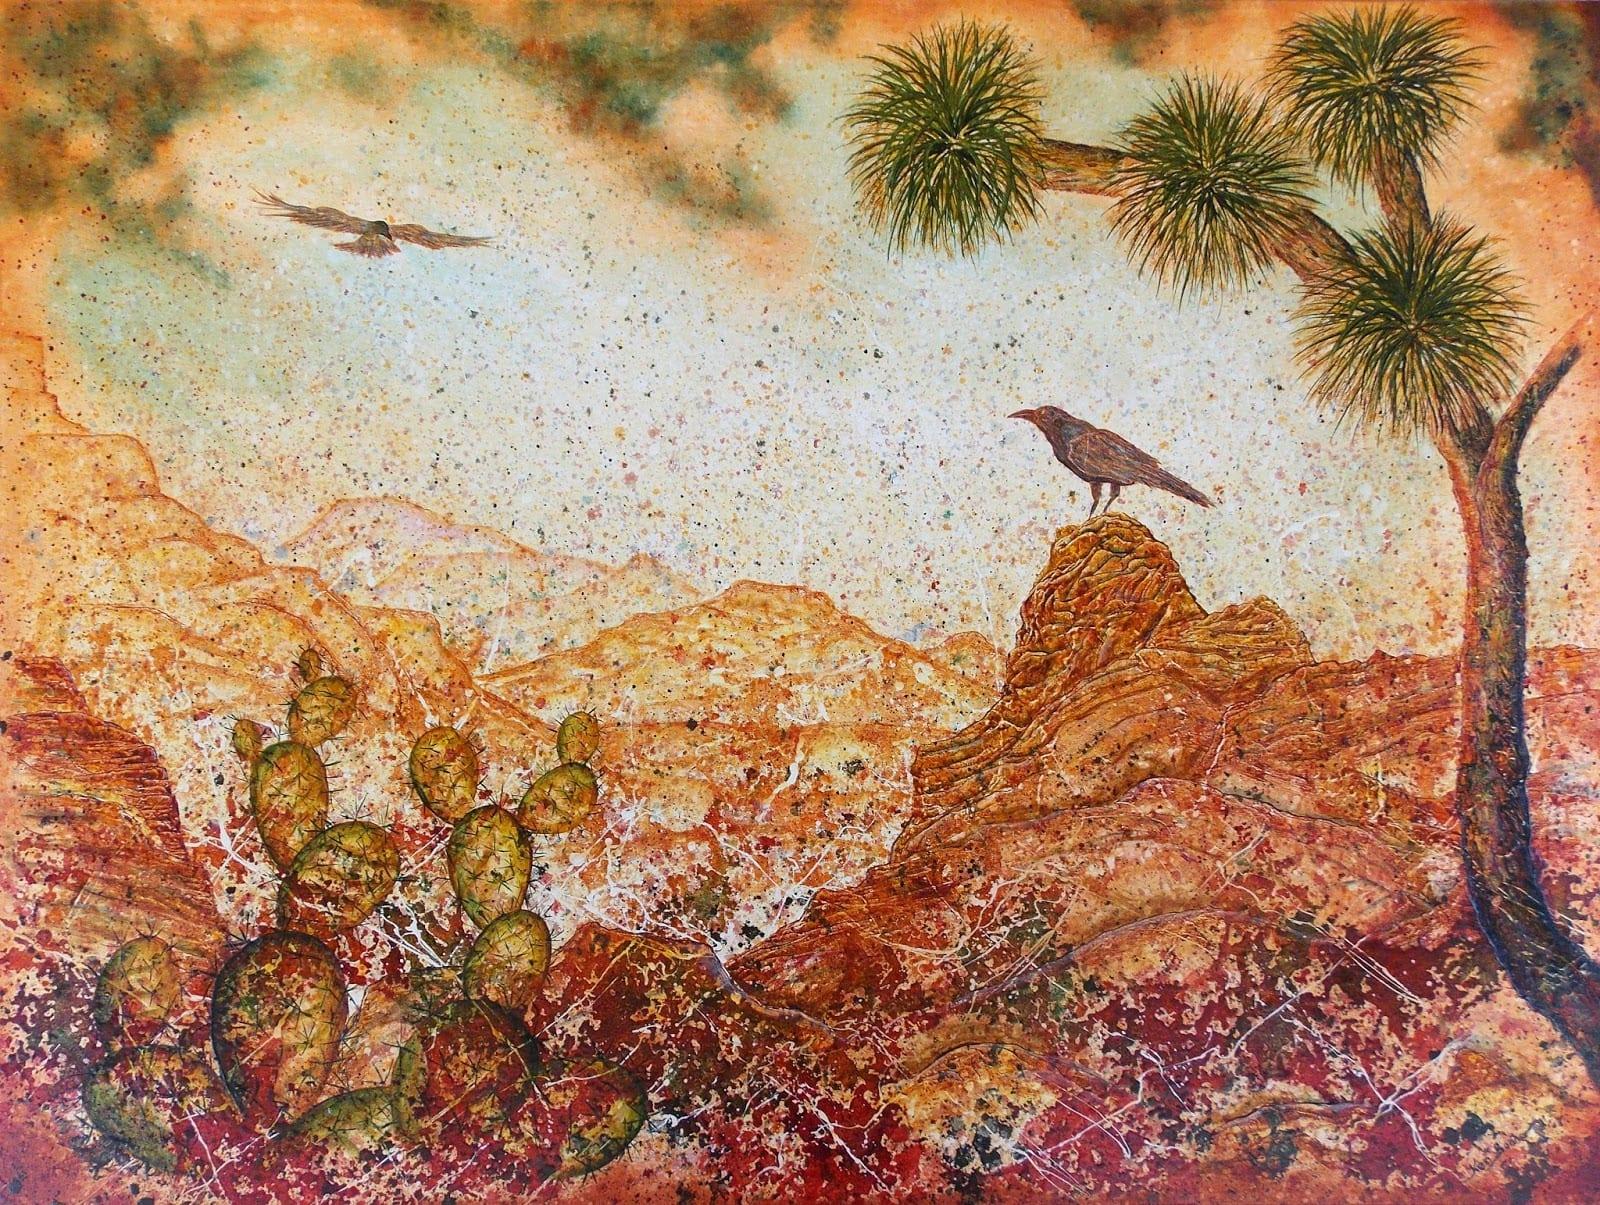 Ken Bonner Art | Instant Enchantment